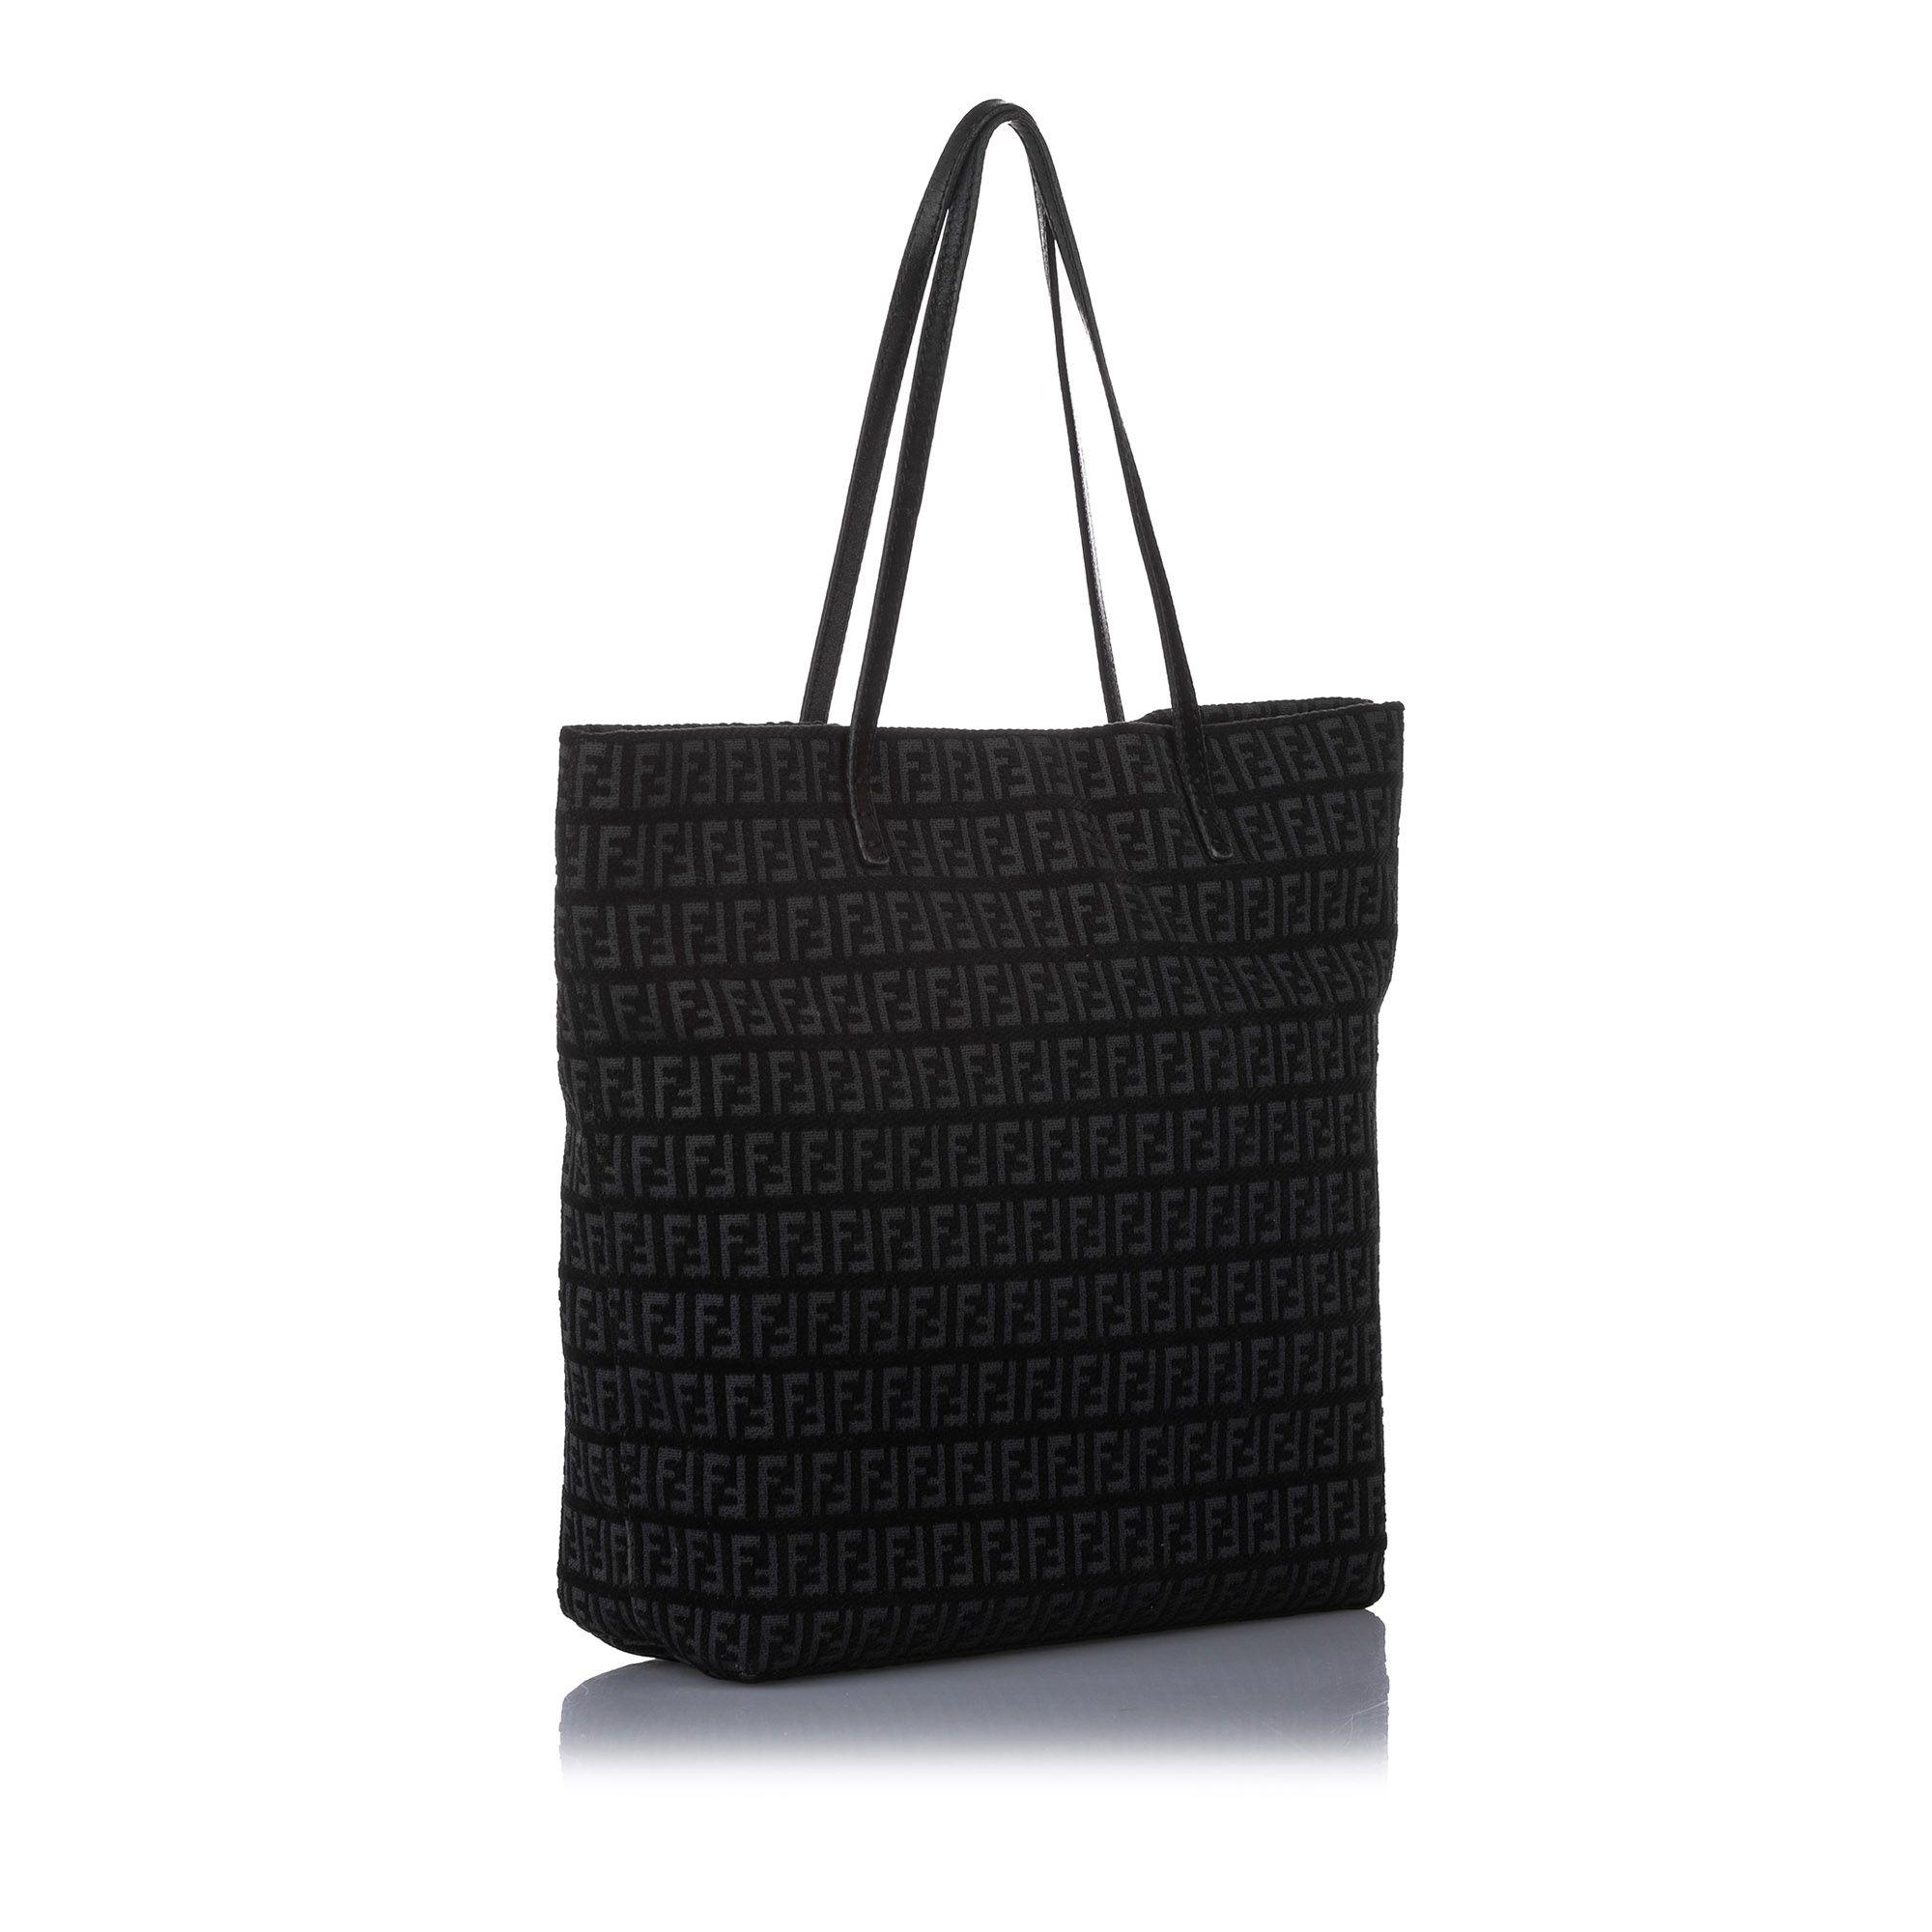 Vintage Fendi Zucchino Canvas Tote Bag Black